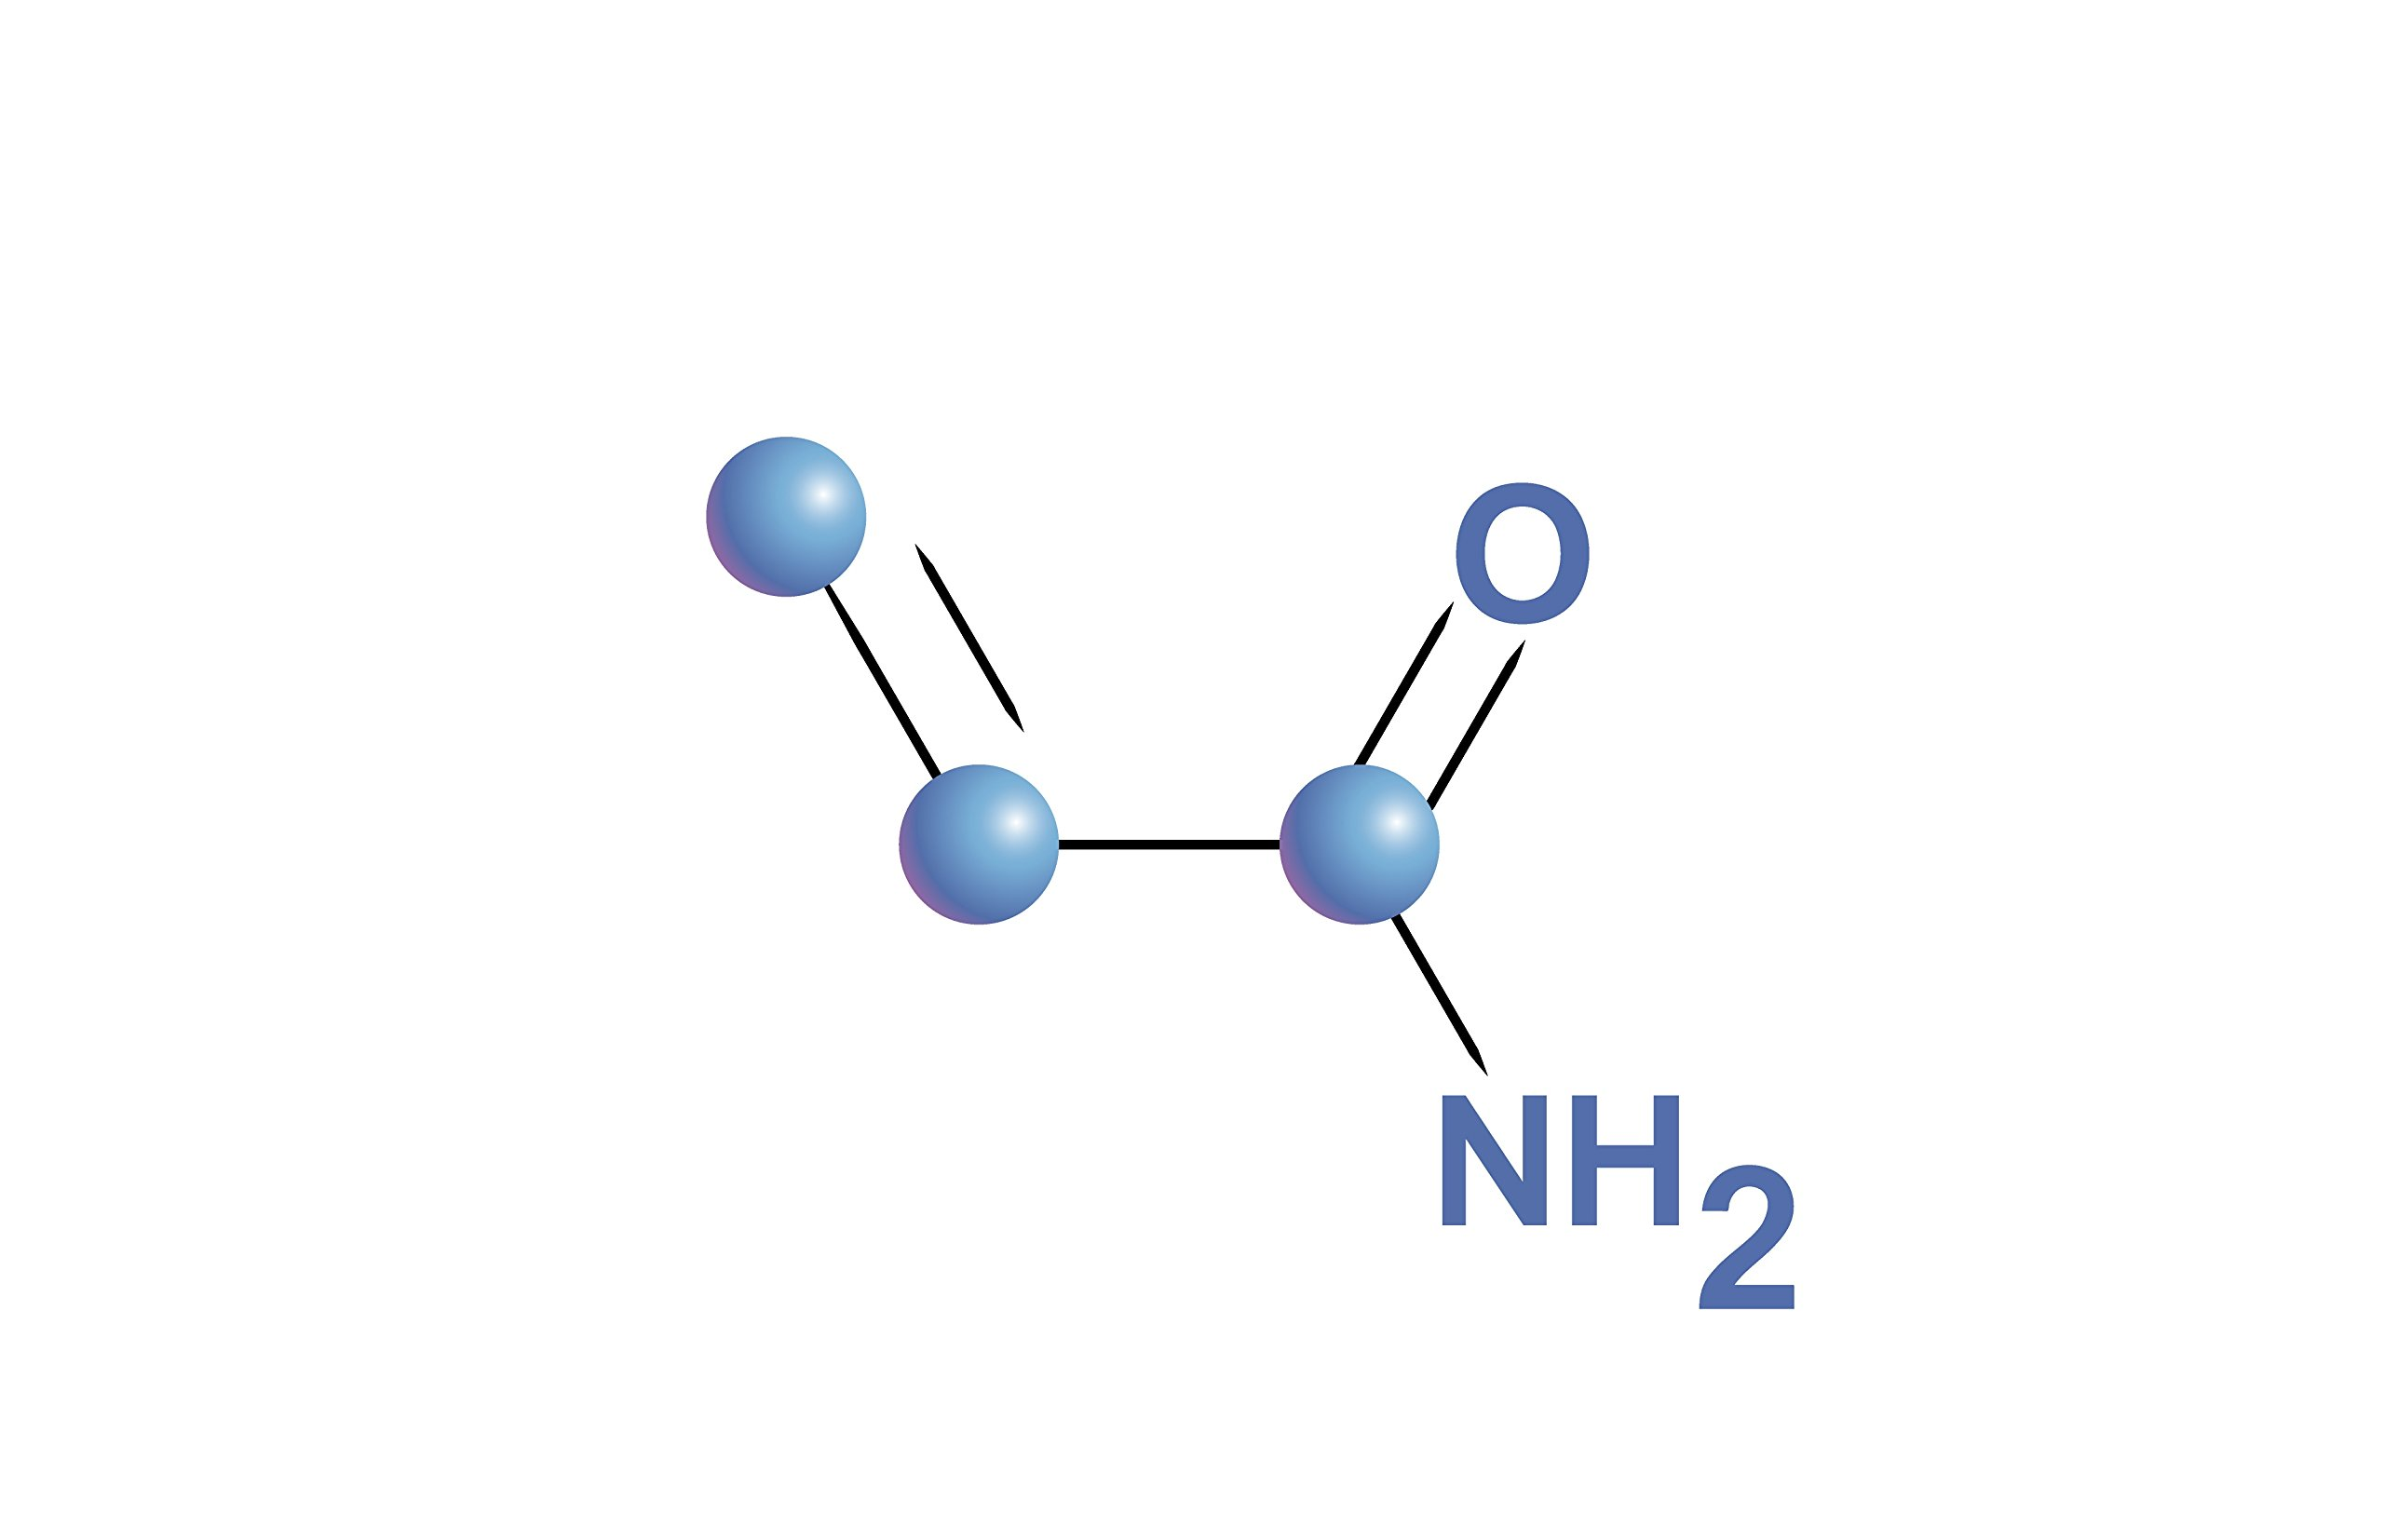 Bovine γ-Globulin Protein Standard [2mg/ml] - 2 x 5 ml